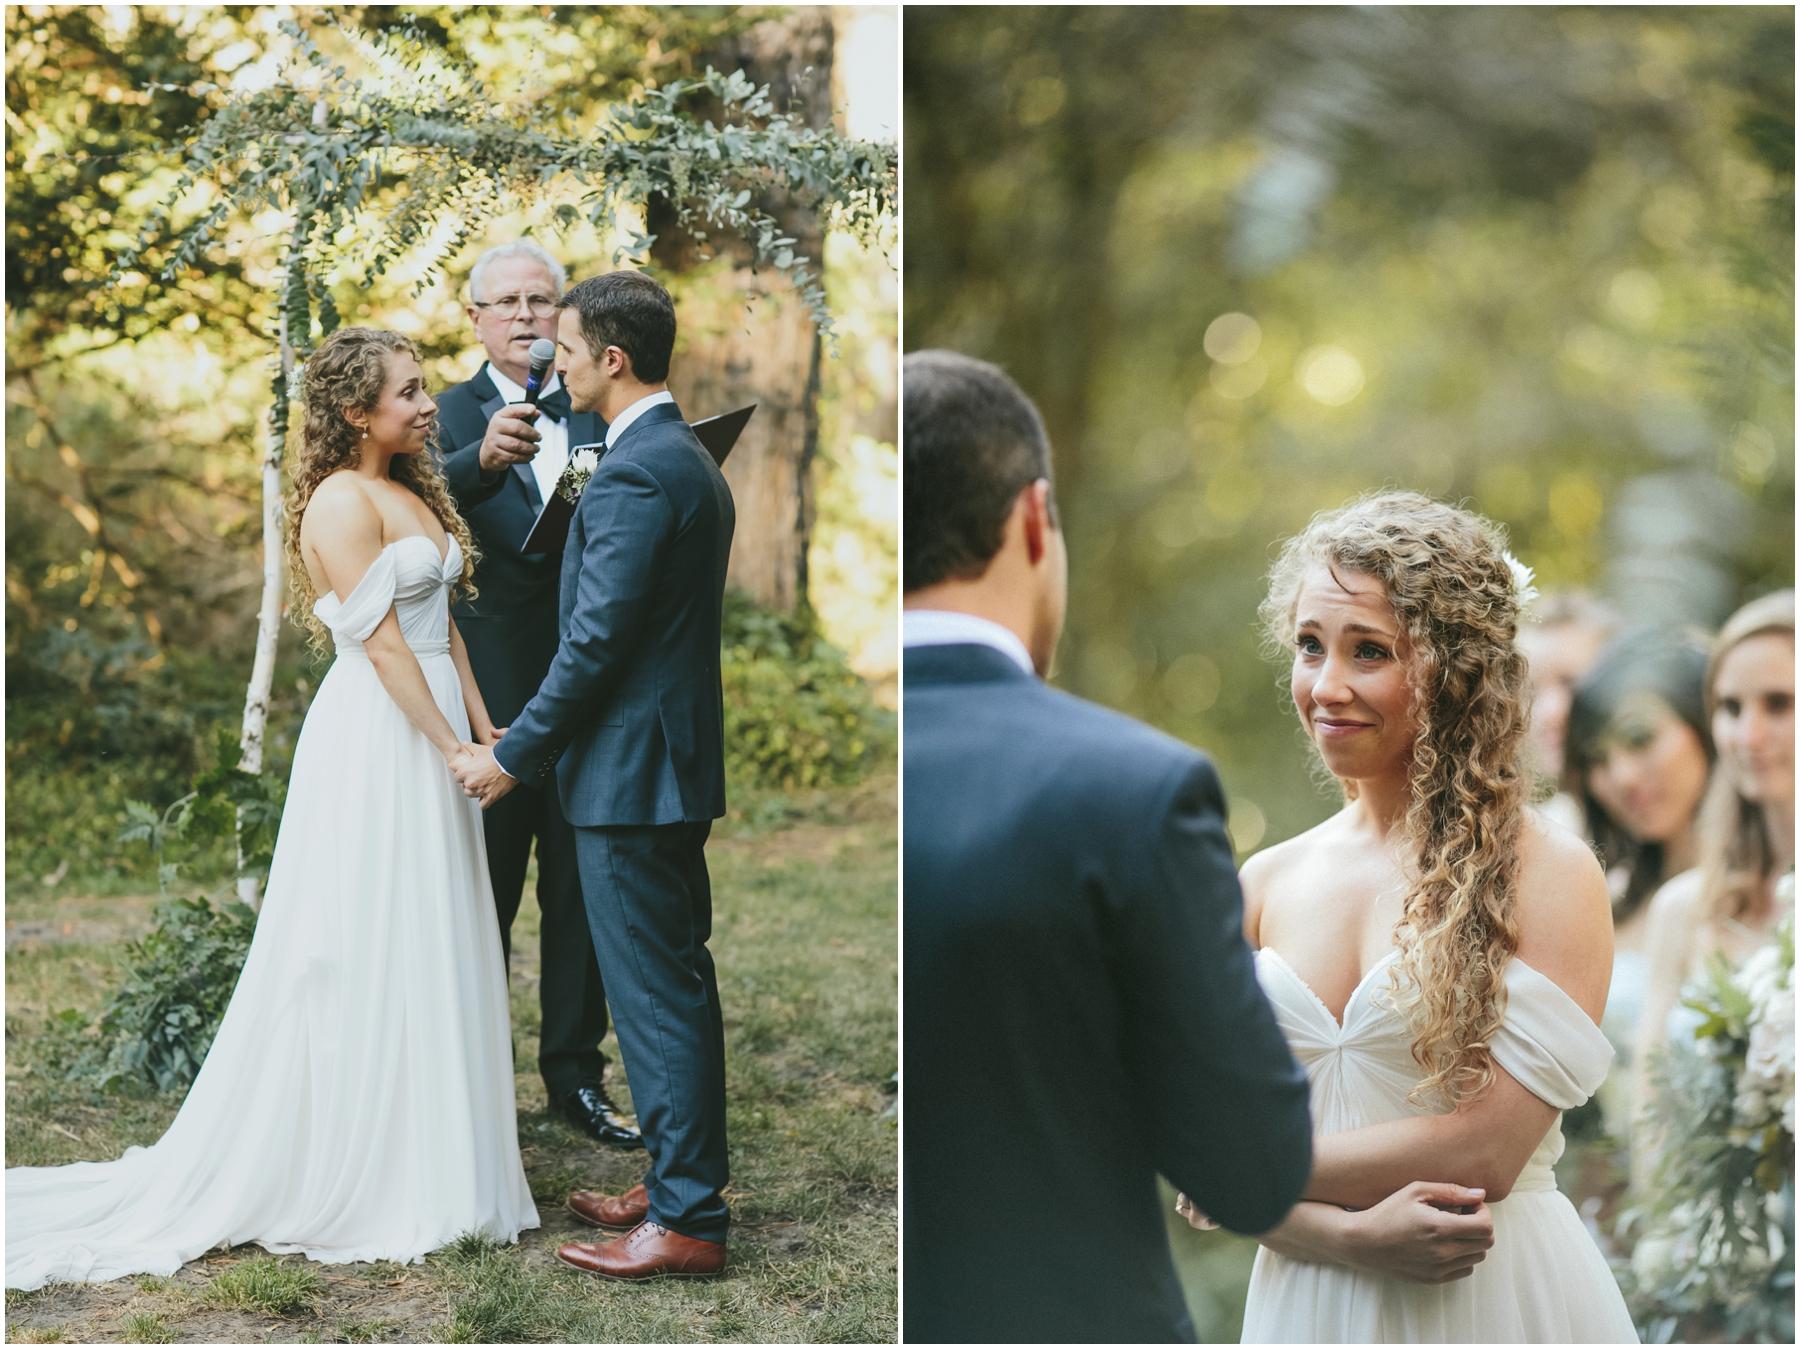 Emily+Paul-WEDDING_KellyBoitanoPhotography_0088